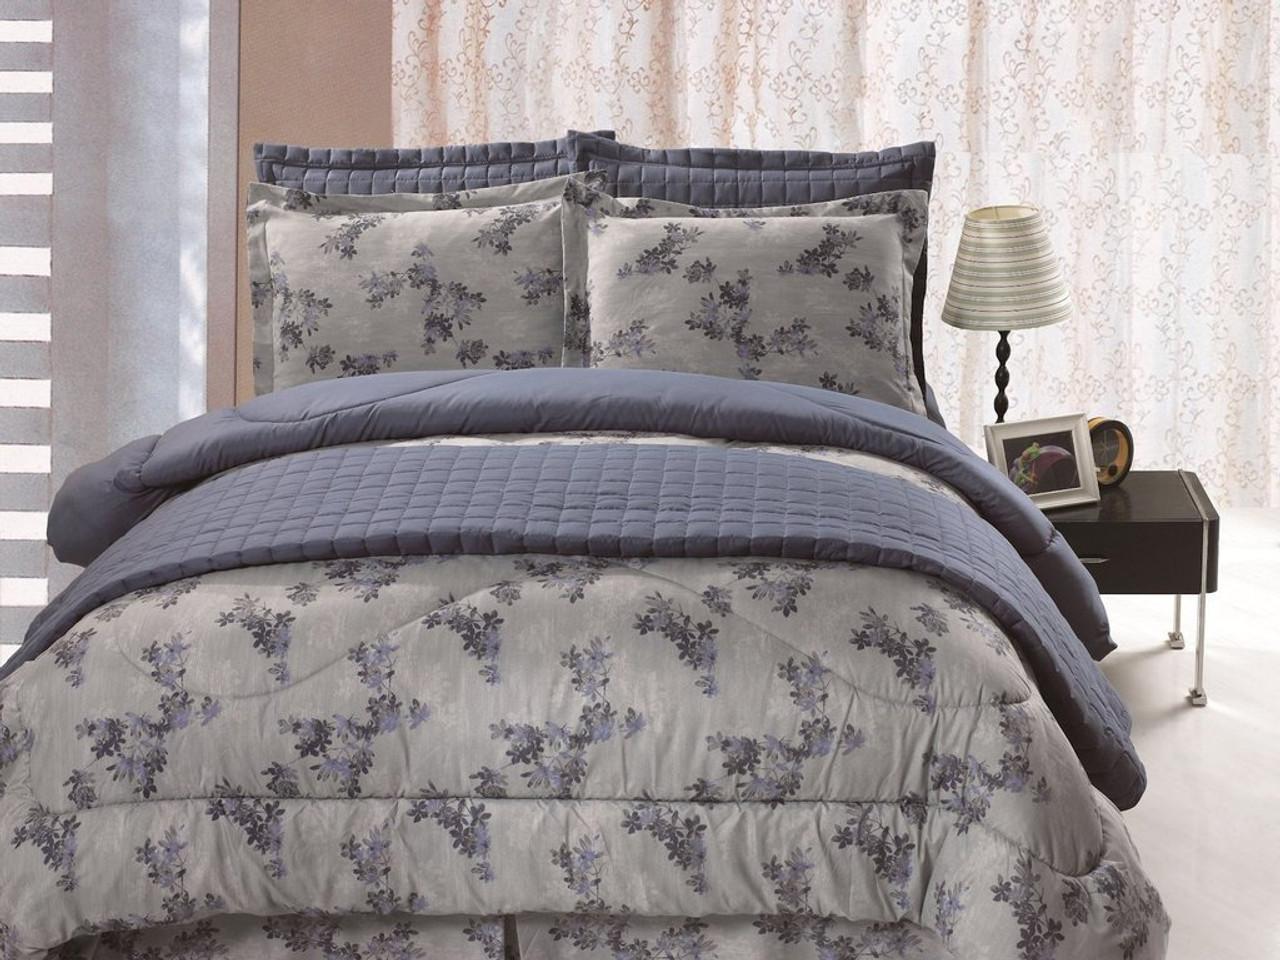 6 pc Microfiber Reversible Floral Print Comforter Set Quilt Included in USA, California, New York, New York City, Los Angeles, San Francisco, Pennsylvania, Washington DC, Virginia, Maryland